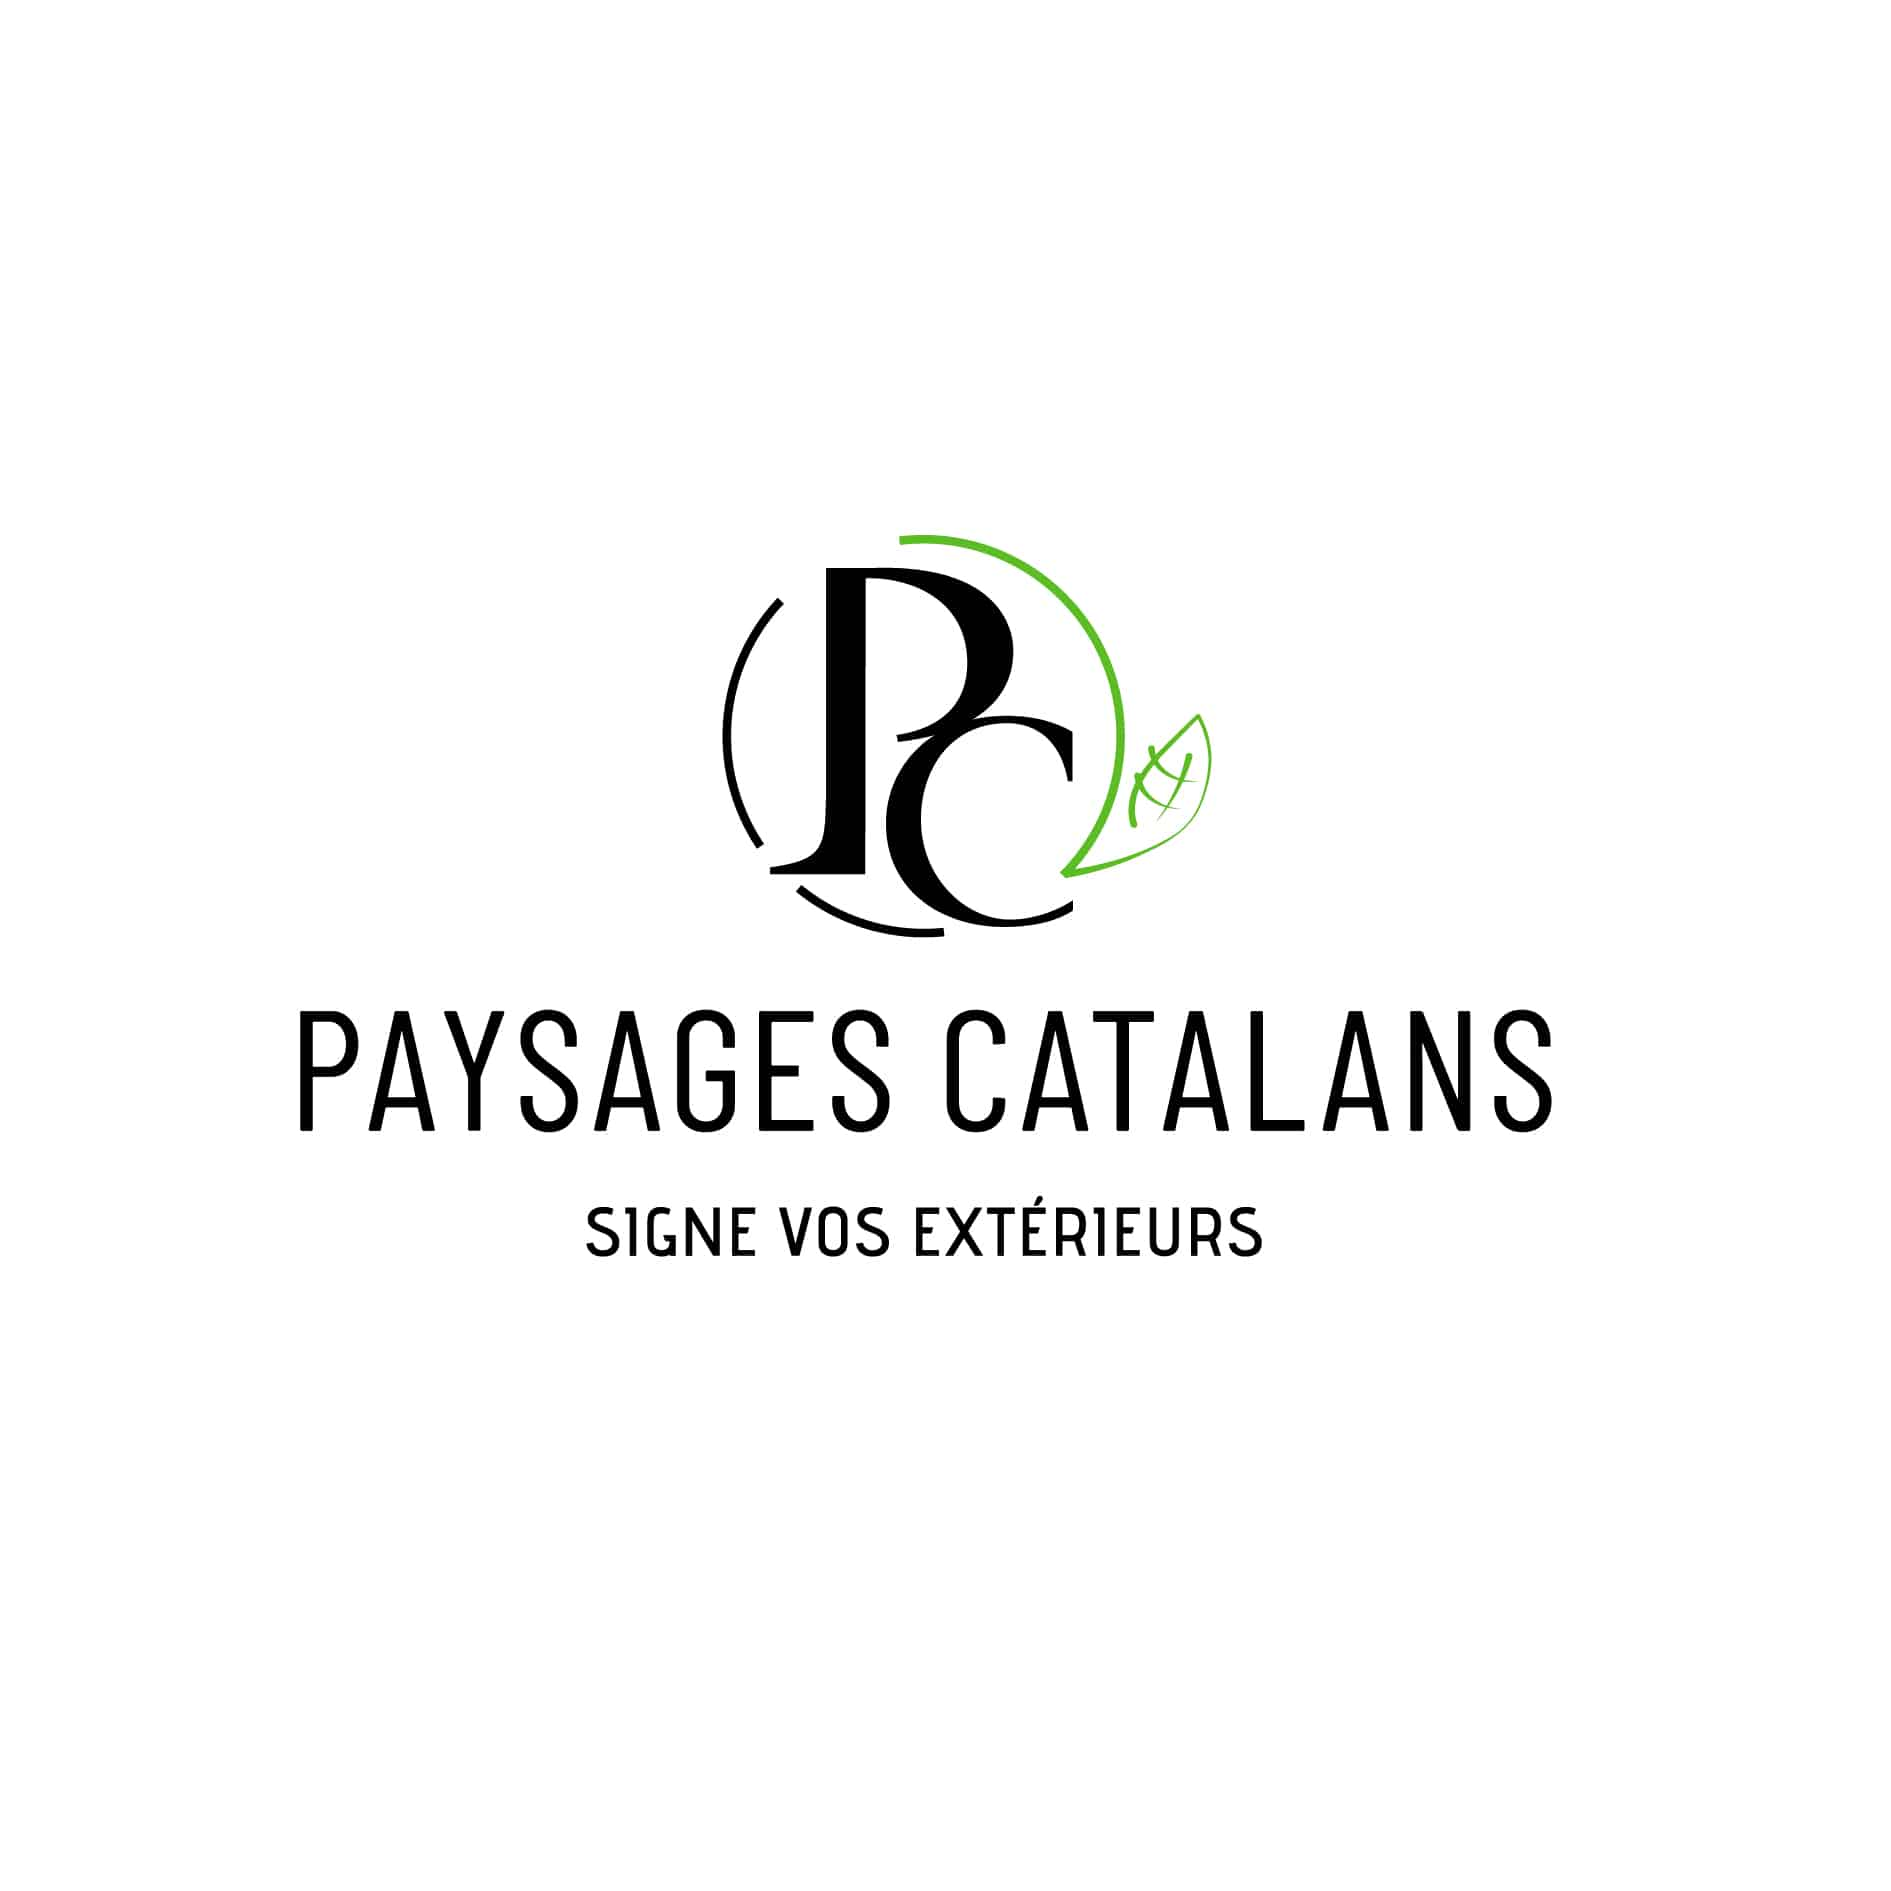 Logo PAYSAGES CATALANS